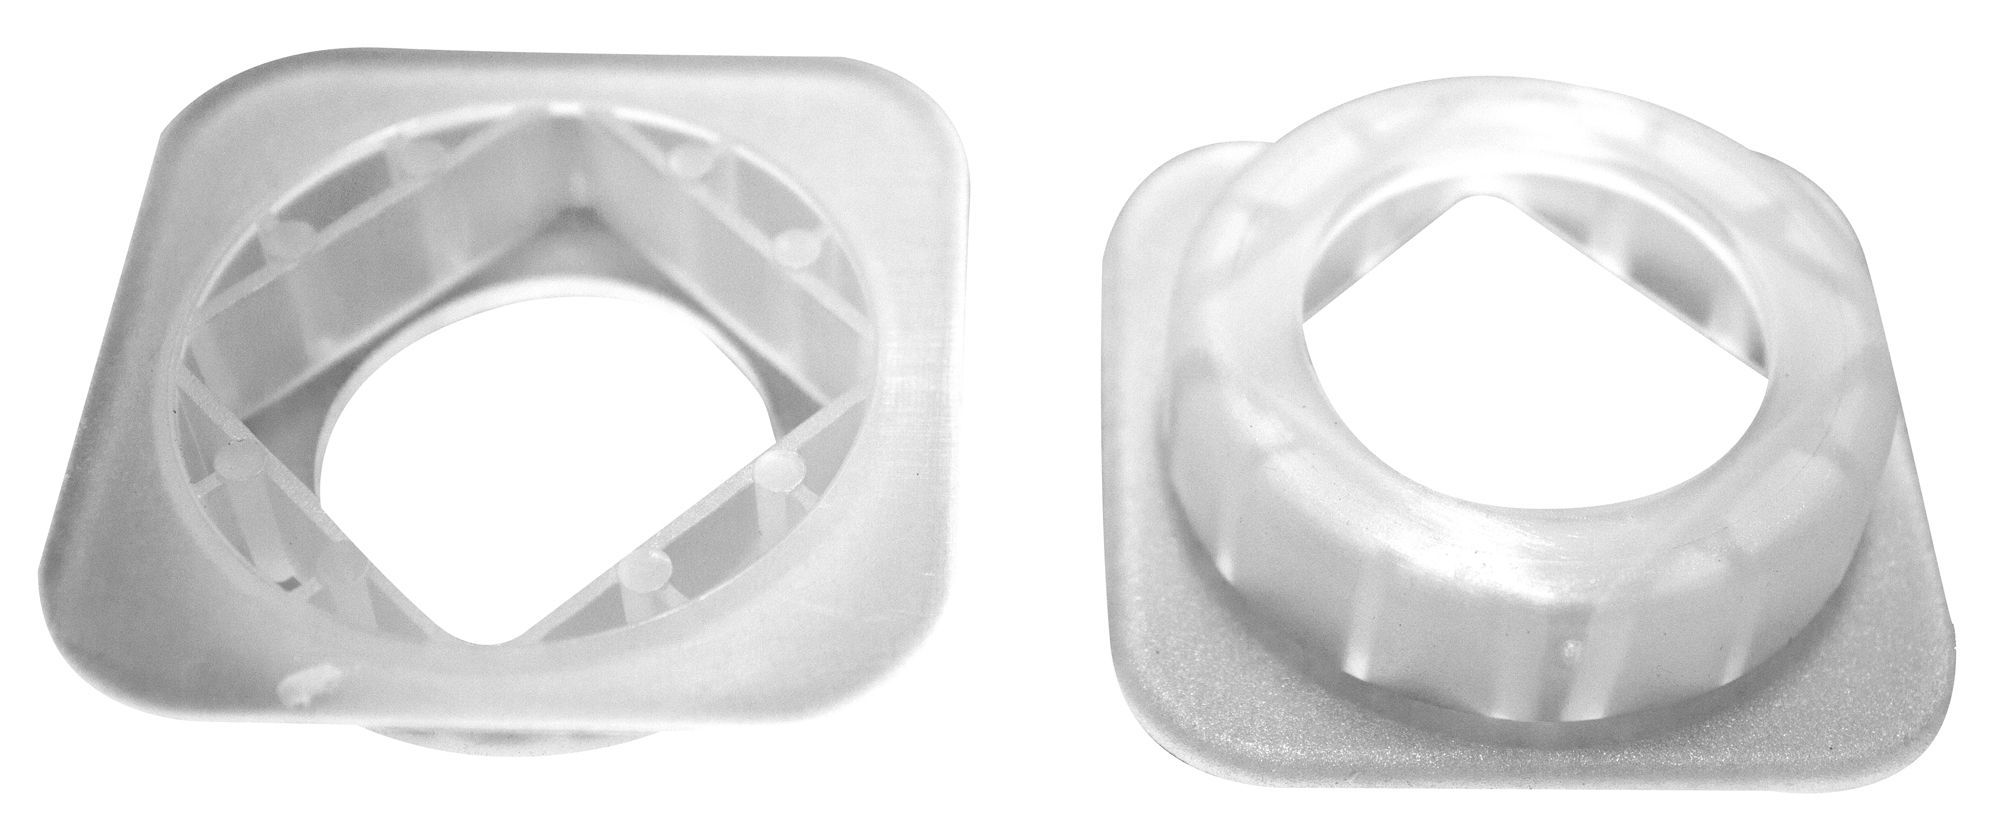 Plumbsure Plastic Top Hat Washer | Departments | DIY at B&Q